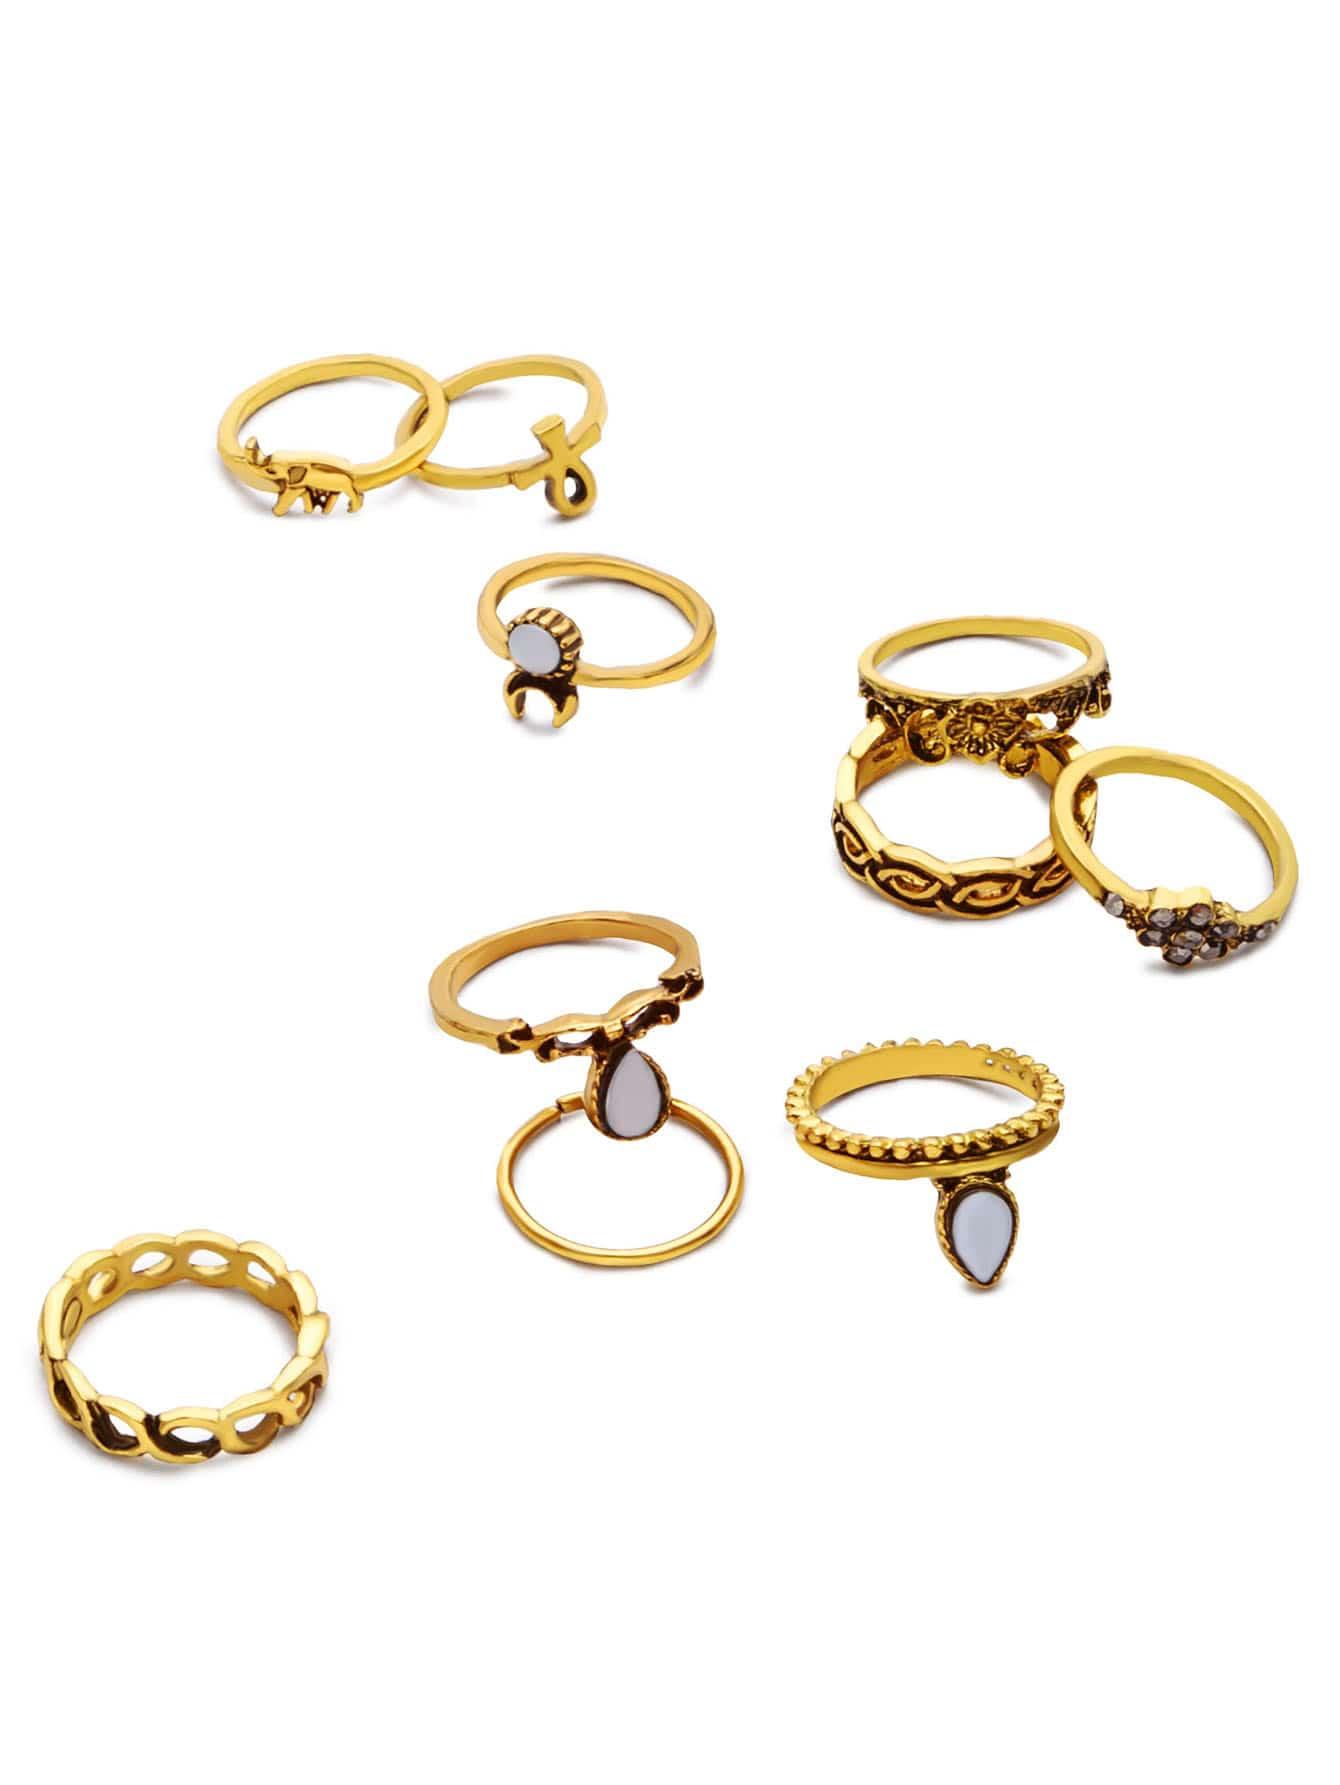 Image of 10PCS Antique Gold Geometric Carved Ring Set